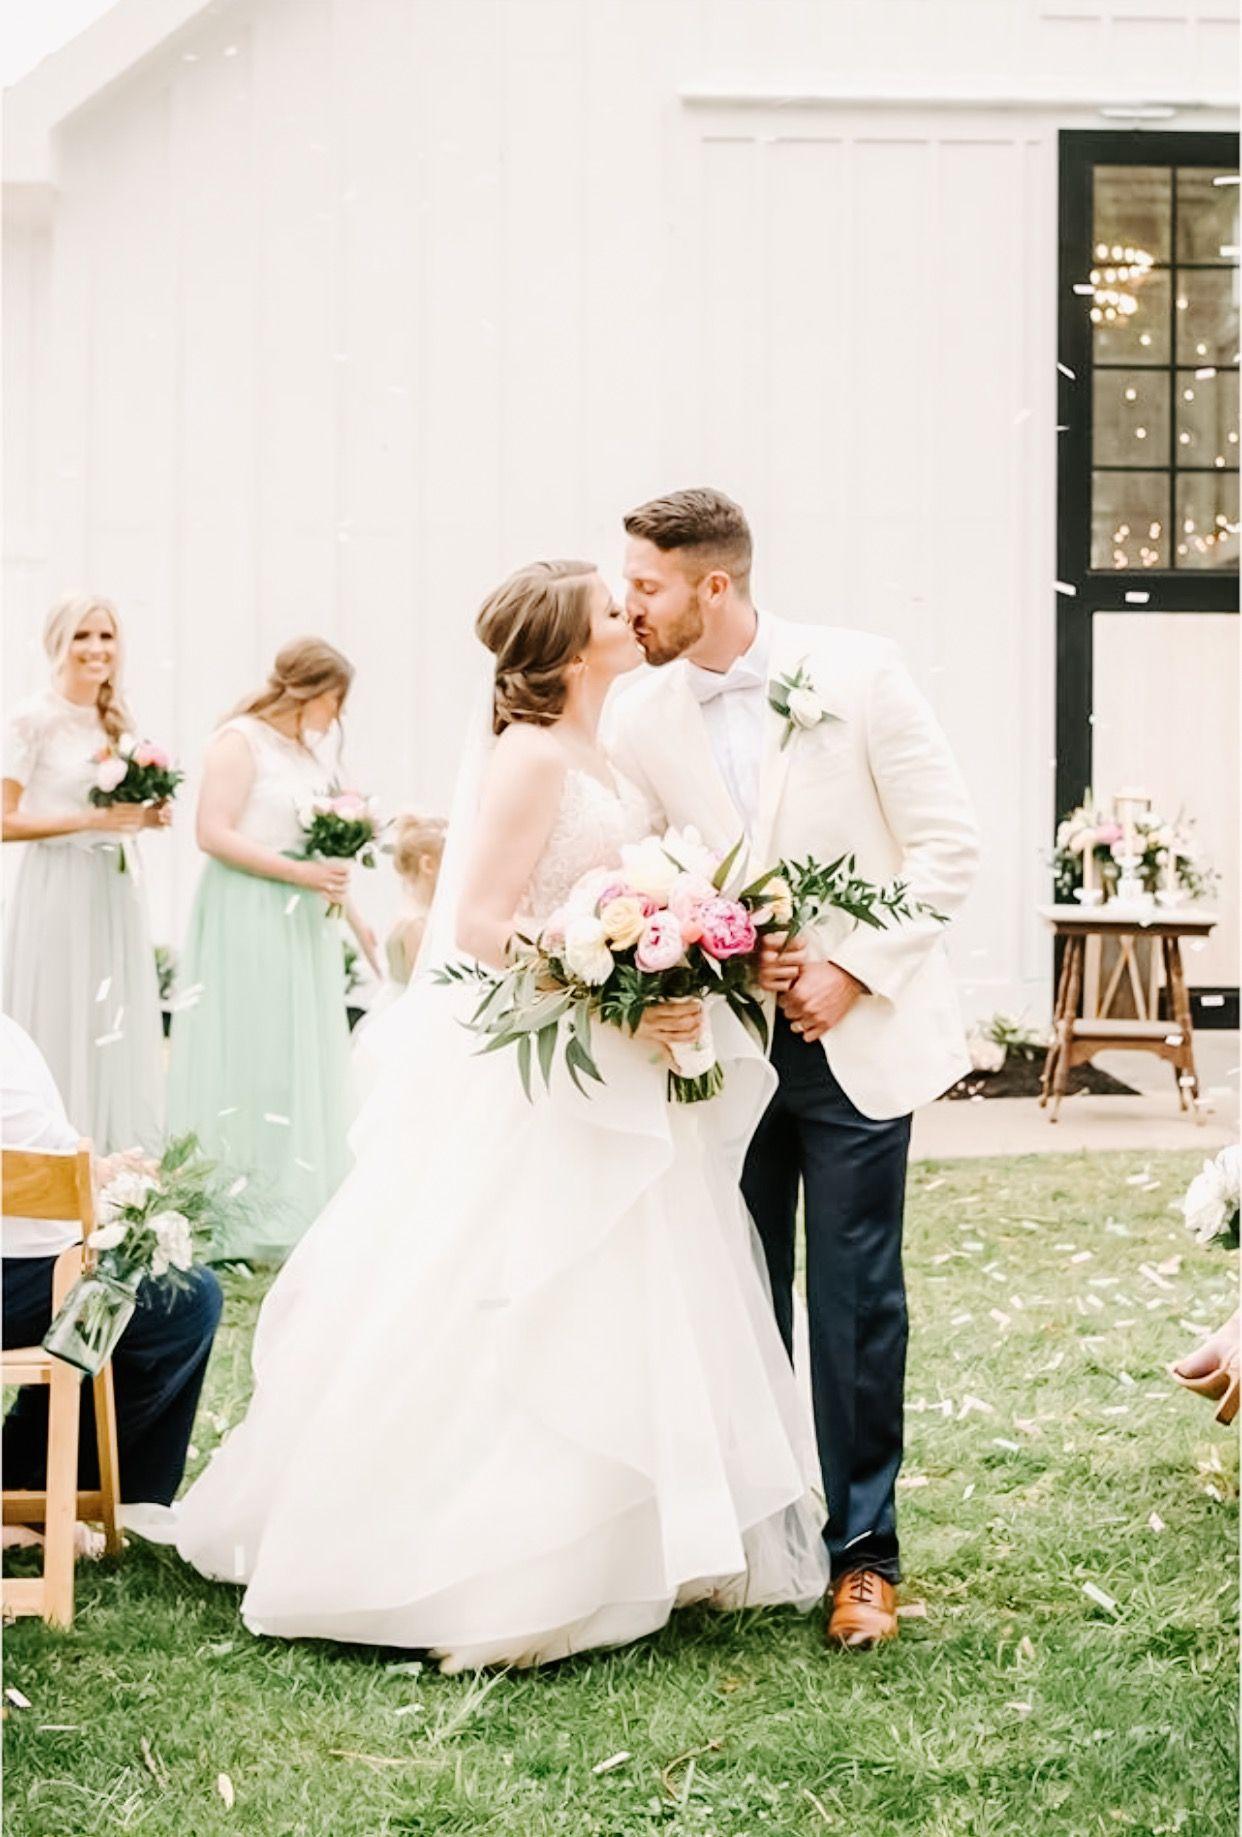 Ashford Acres Inn Bride And Groom Kentucky Wedding Venues Kentucky Wedding Historic Wedding